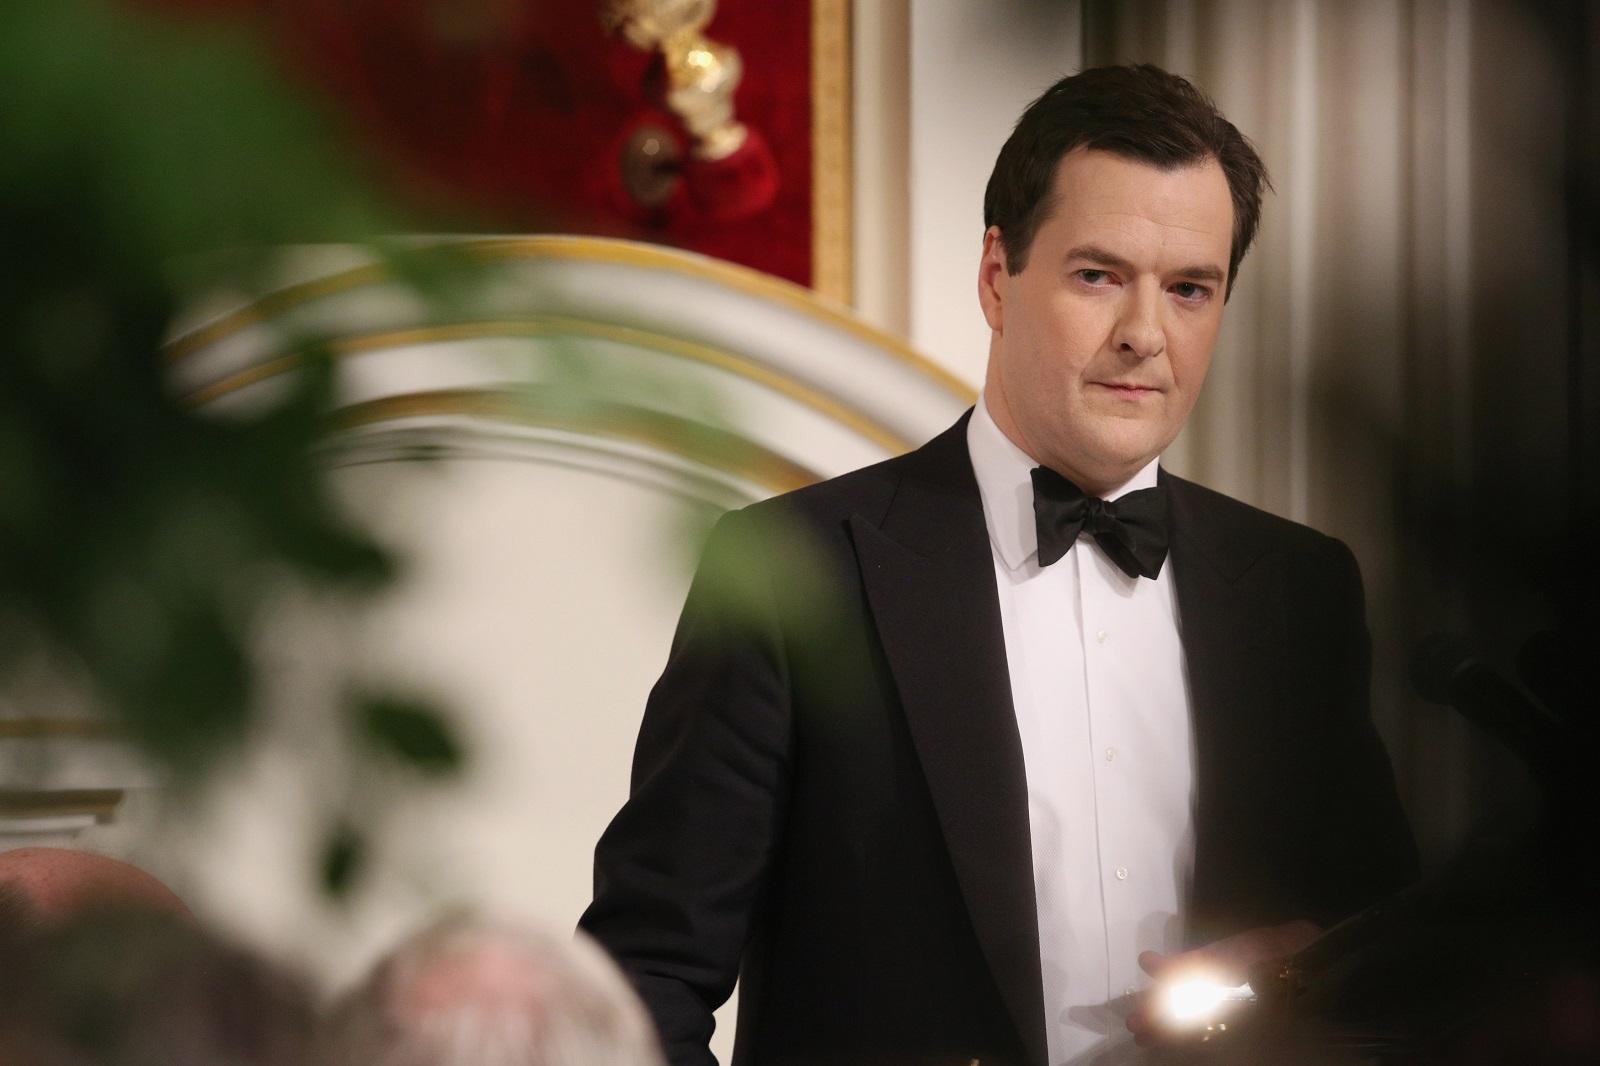 George Osborne during the Mansion House speech